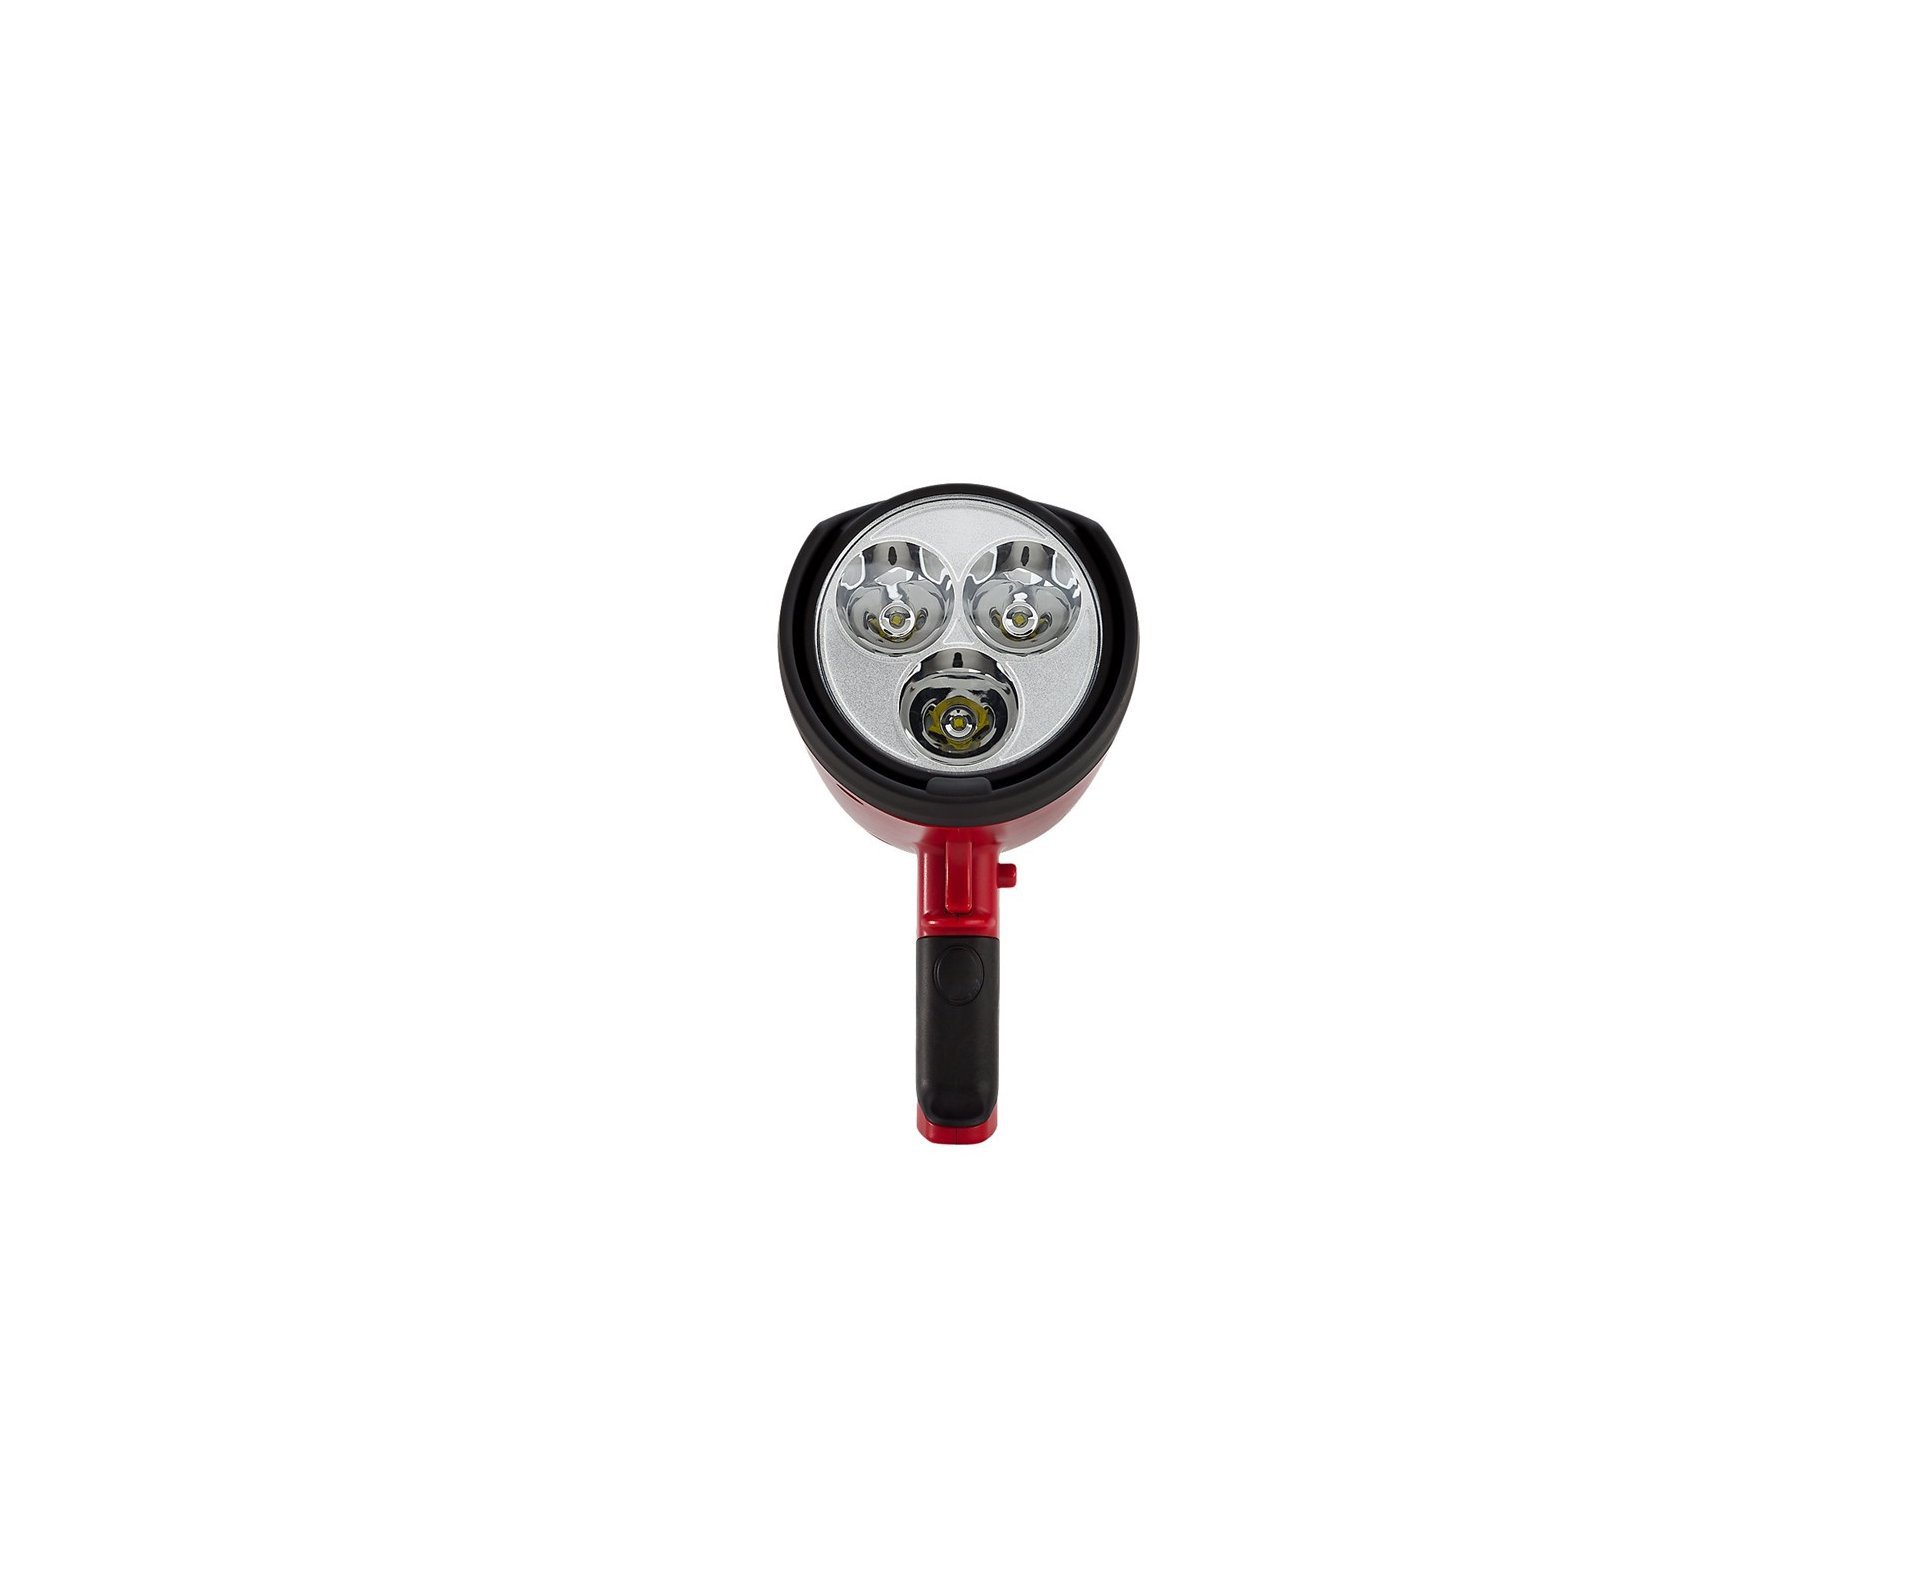 Lanterna Tocha Led Cpx 6 700 Lumens - Coleman